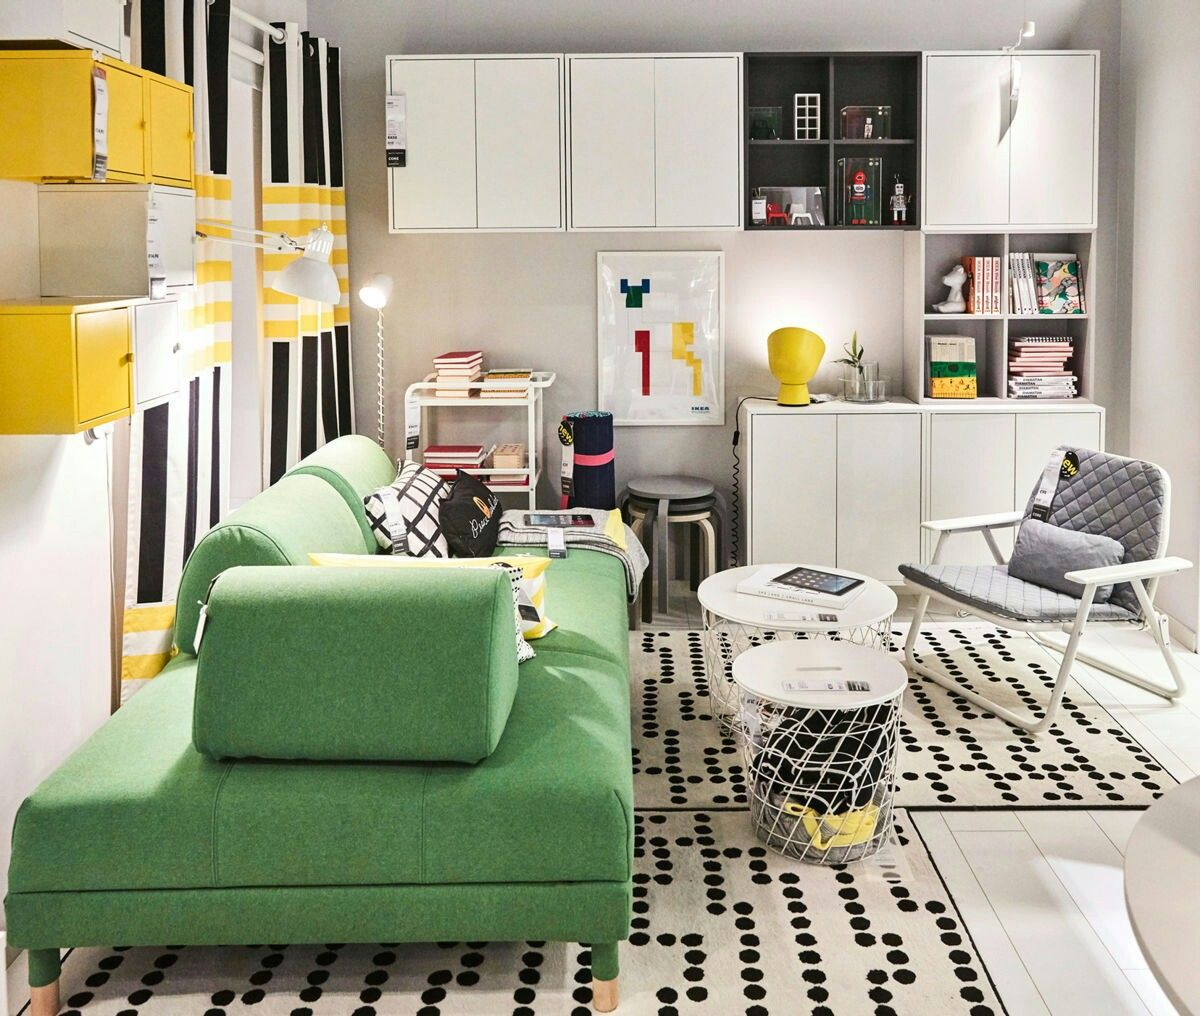 Studio Room Ideas Ikea: Pin By Alexandra Calero On DIY